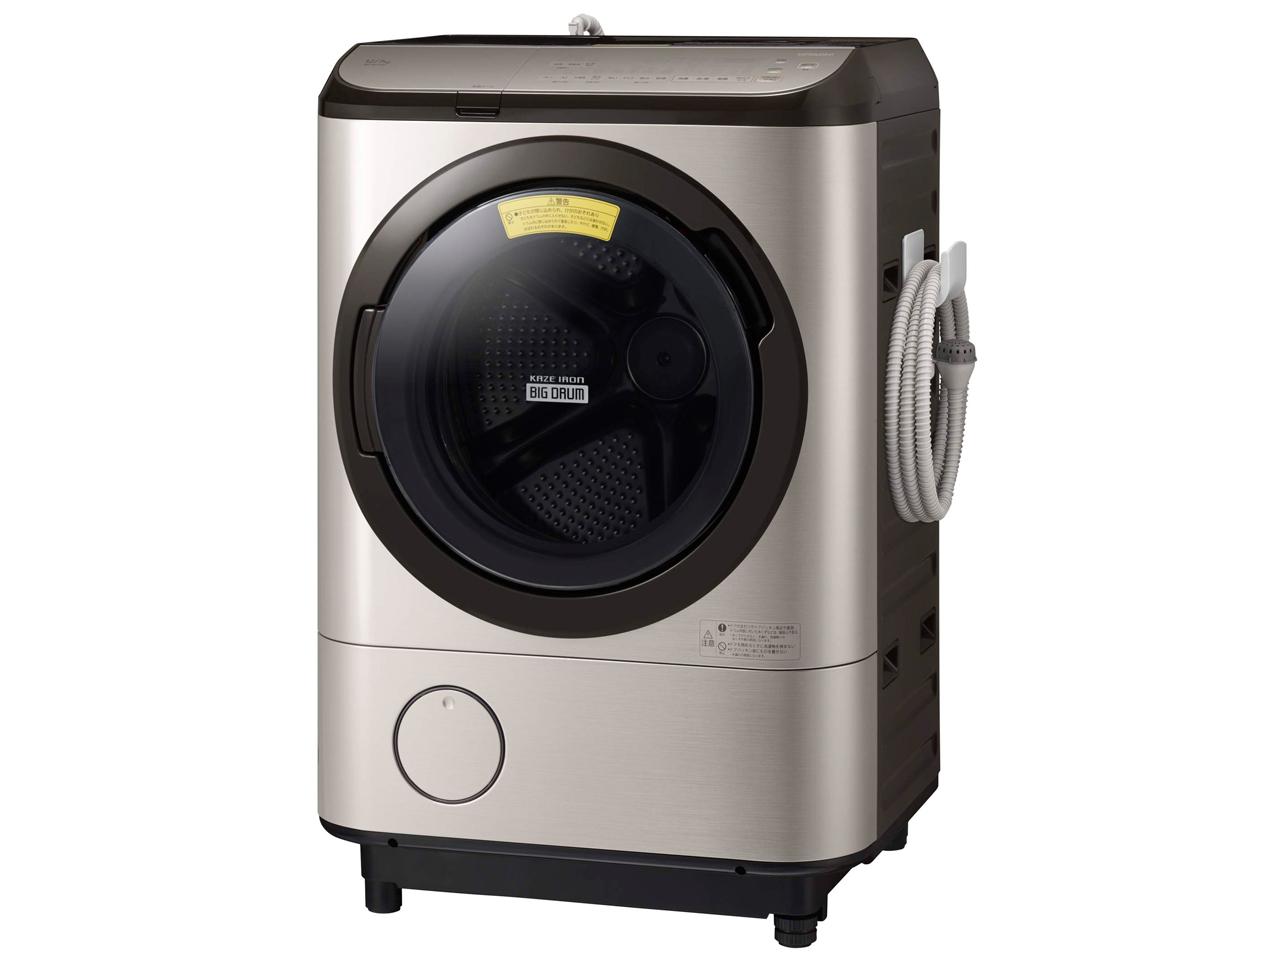 BD-NX120FL-N 日立 ドラム洗濯乾燥機